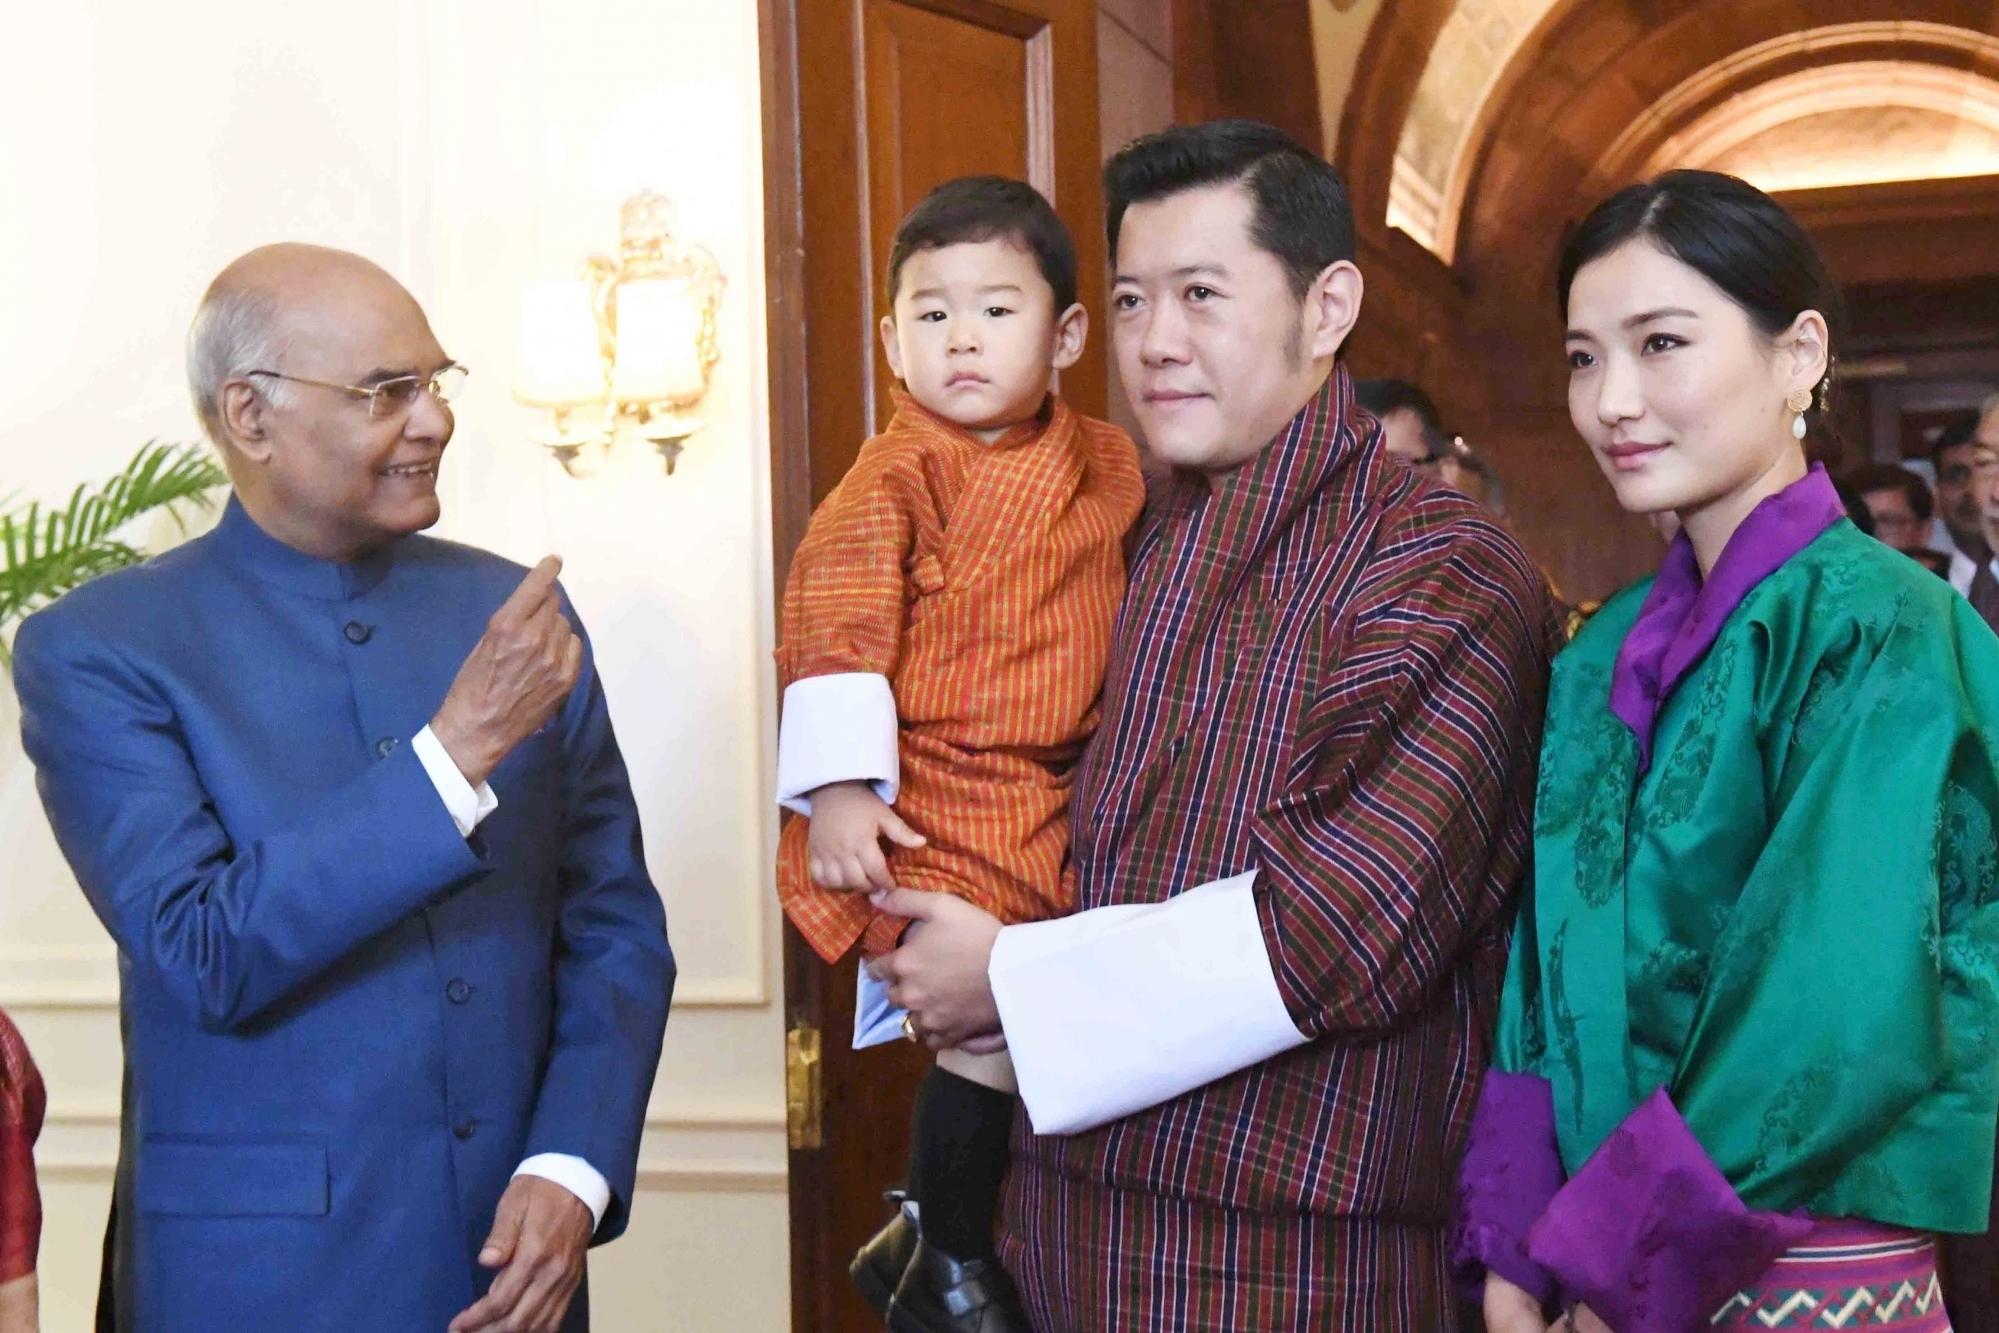 bhutan's role in resolving doklam, King Jigme Khesar Namgyel Wangchuck